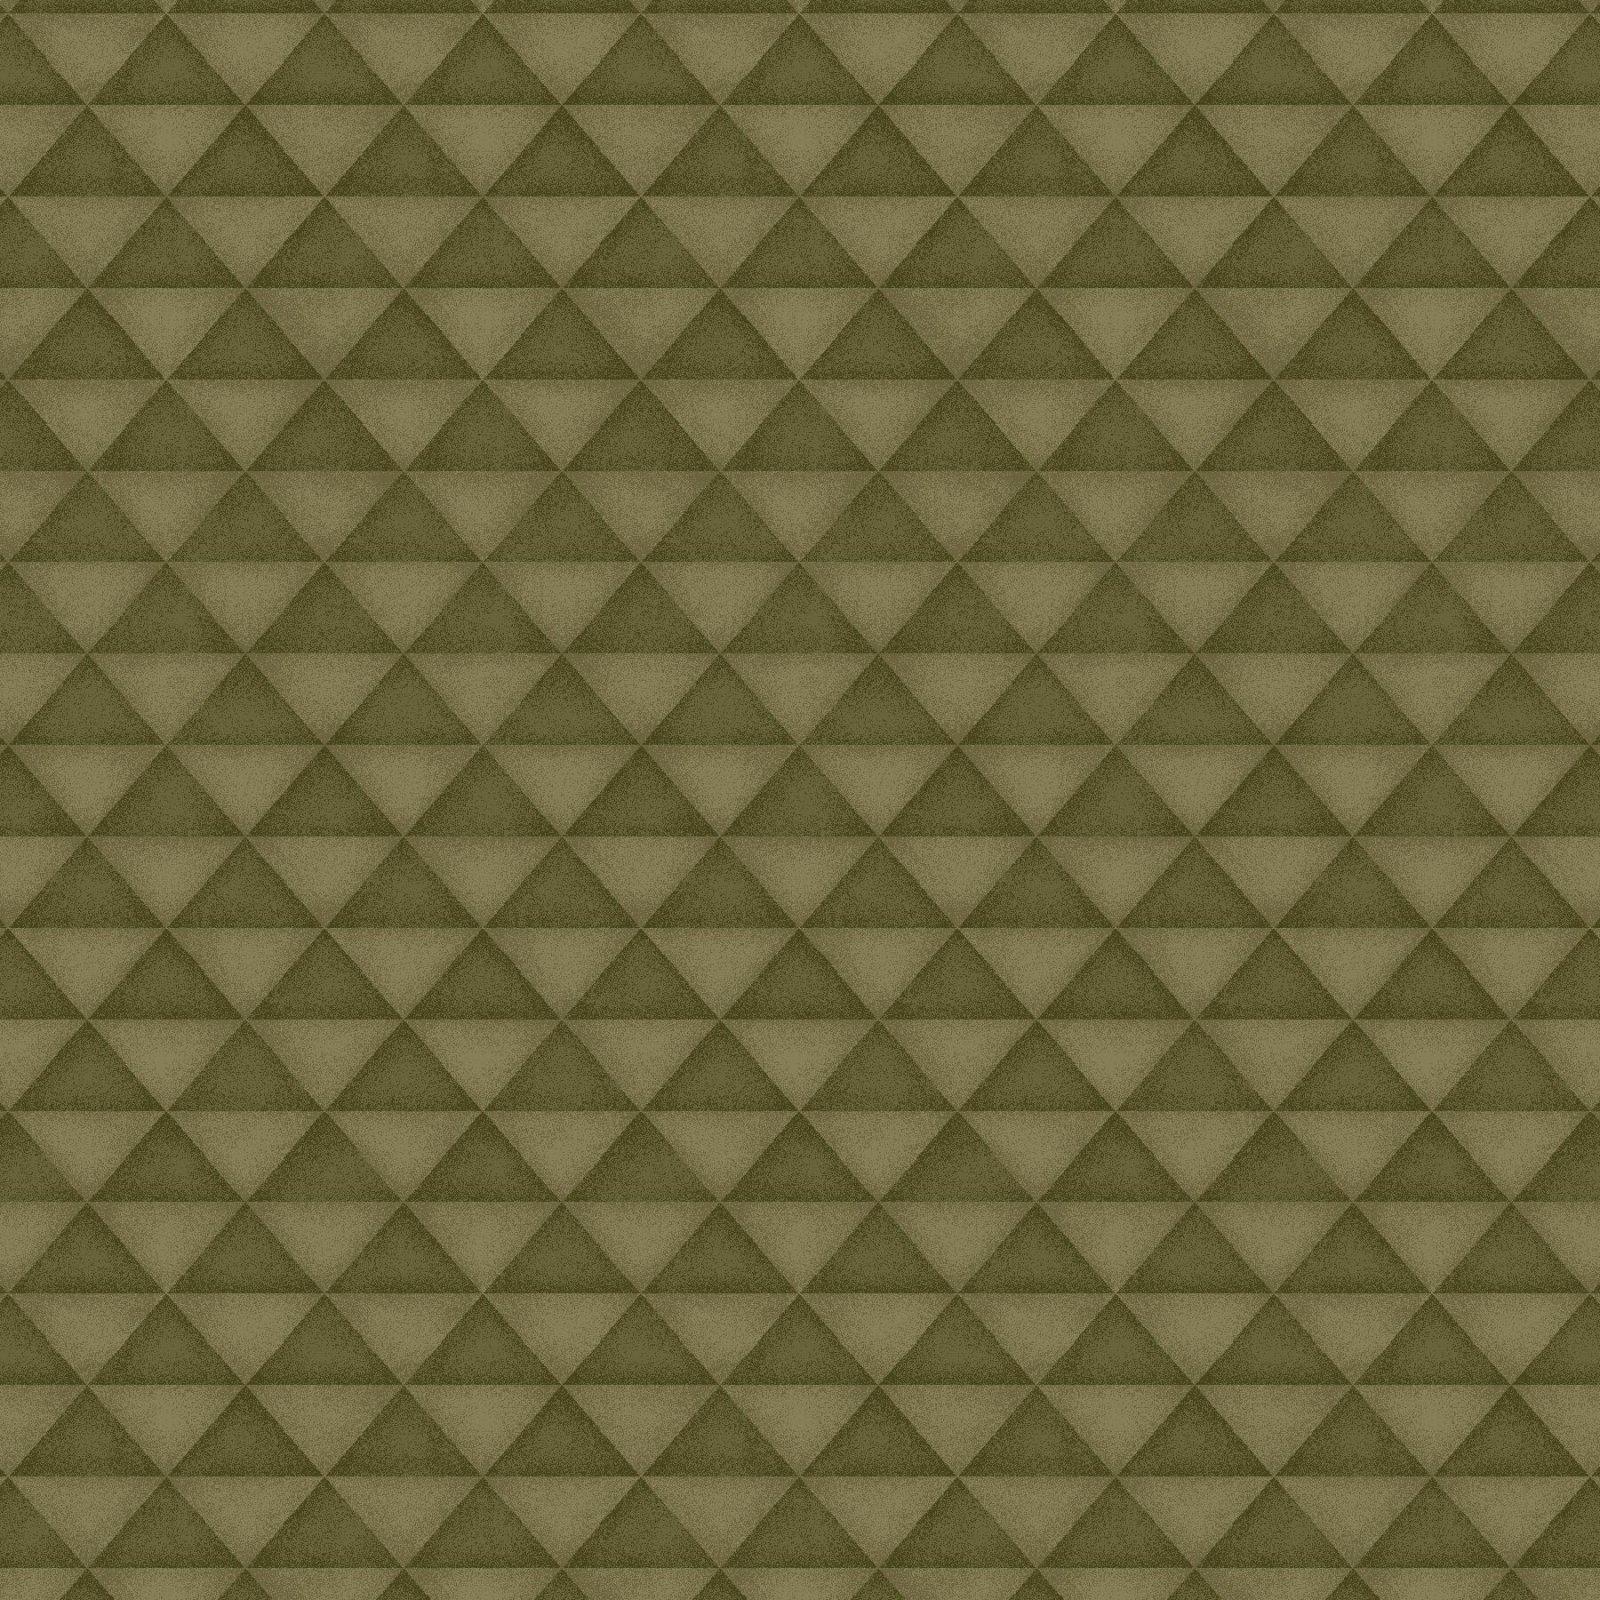 HG-Folk Art Flannel IV 2582F-66 Forest - Half Square Triangles